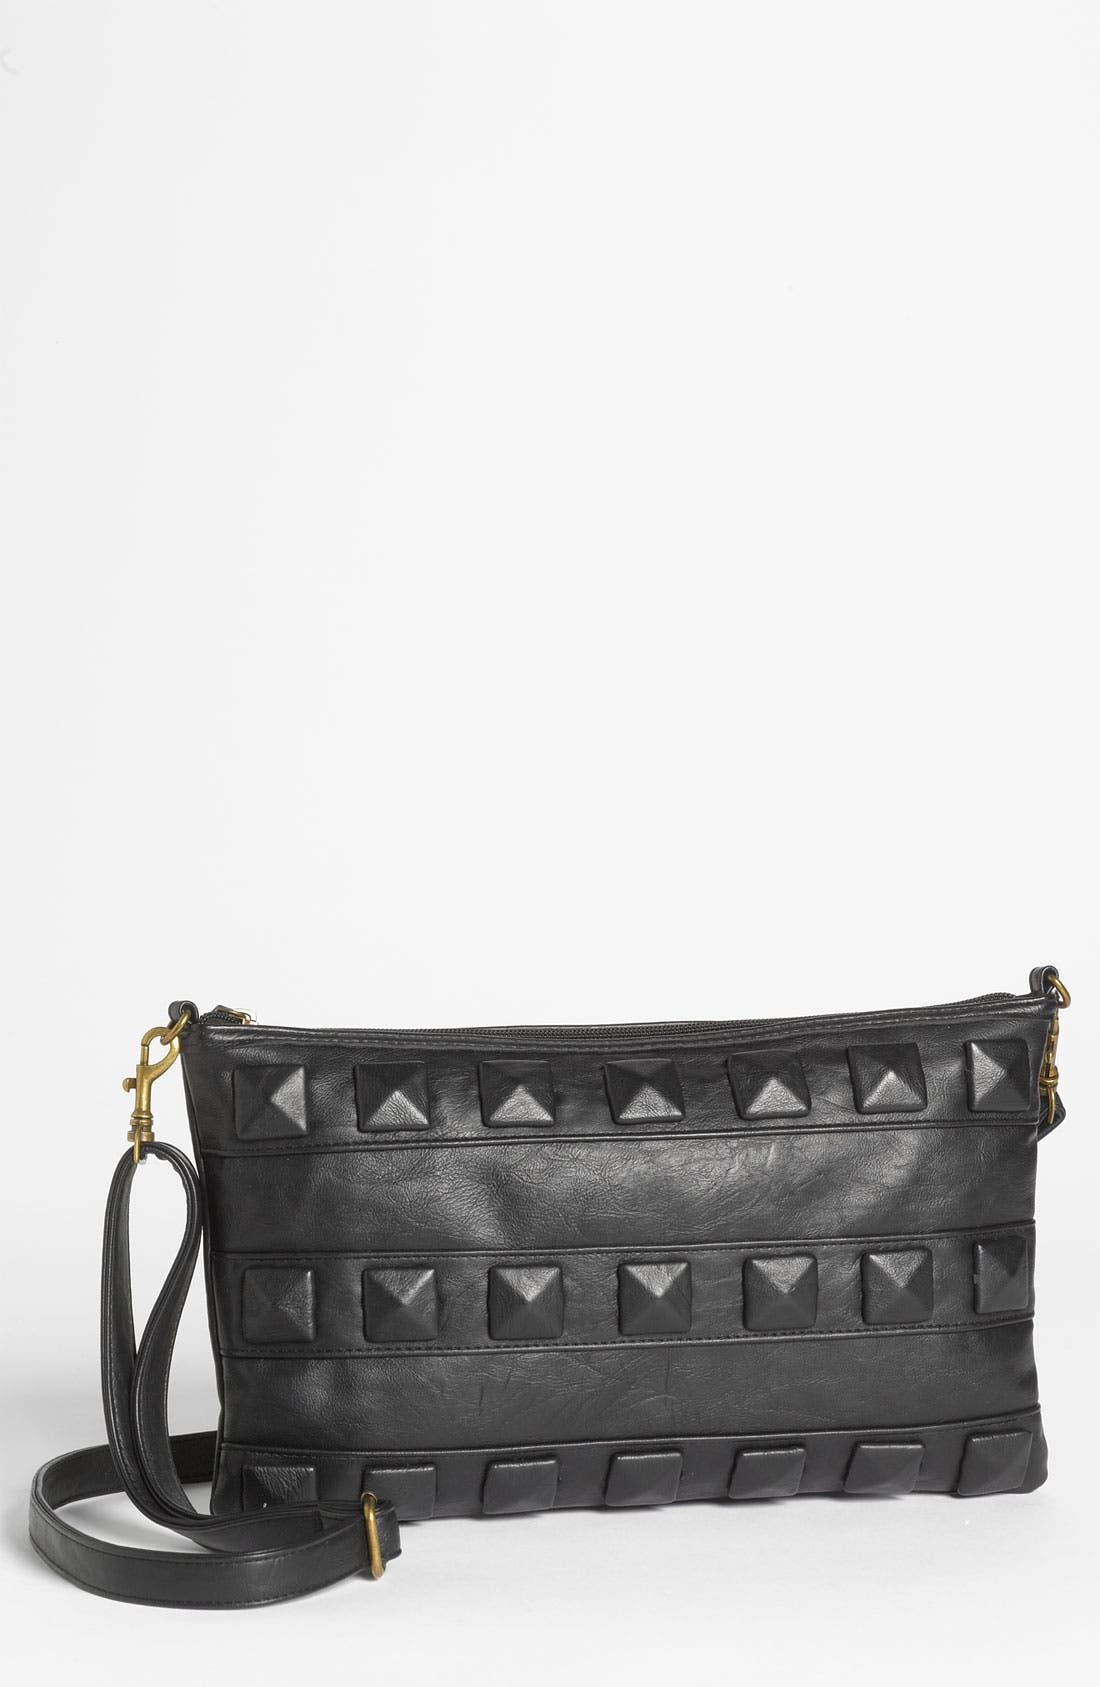 Alternate Image 1 Selected - Lulu Studded Faux Leather Crossbody Bag